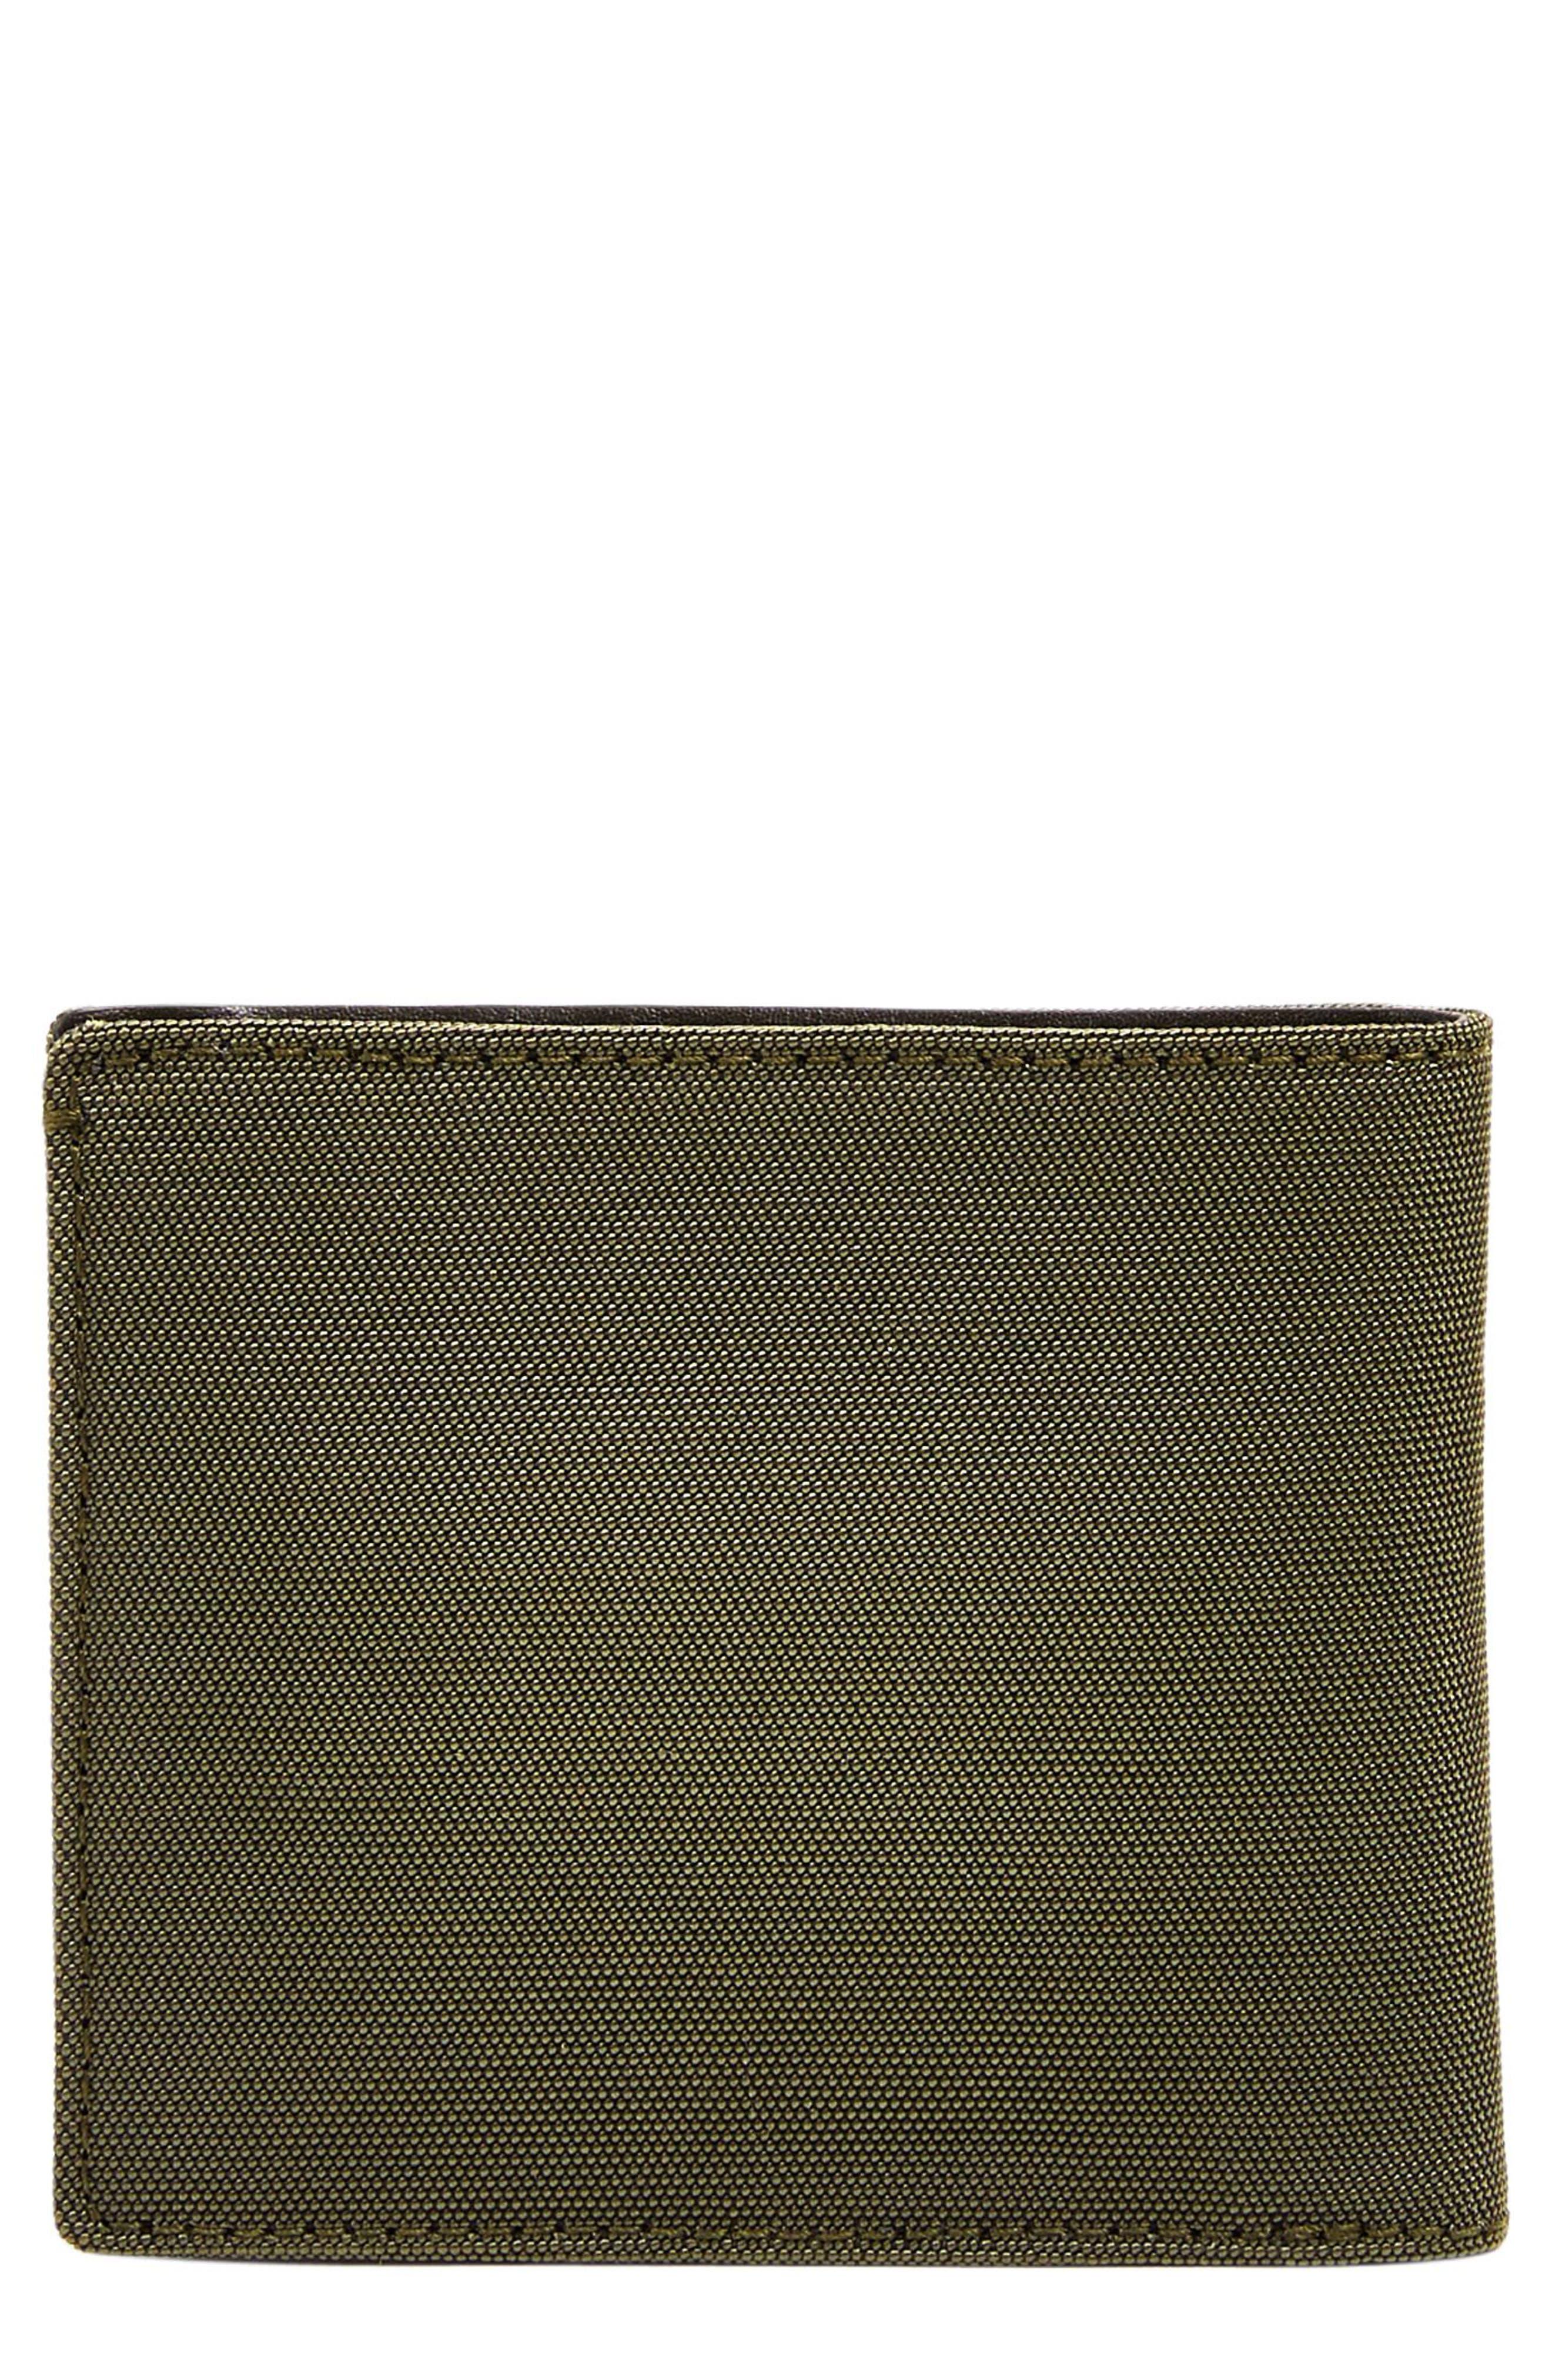 Passcase Wallet,                             Main thumbnail 1, color,                             Dark Green